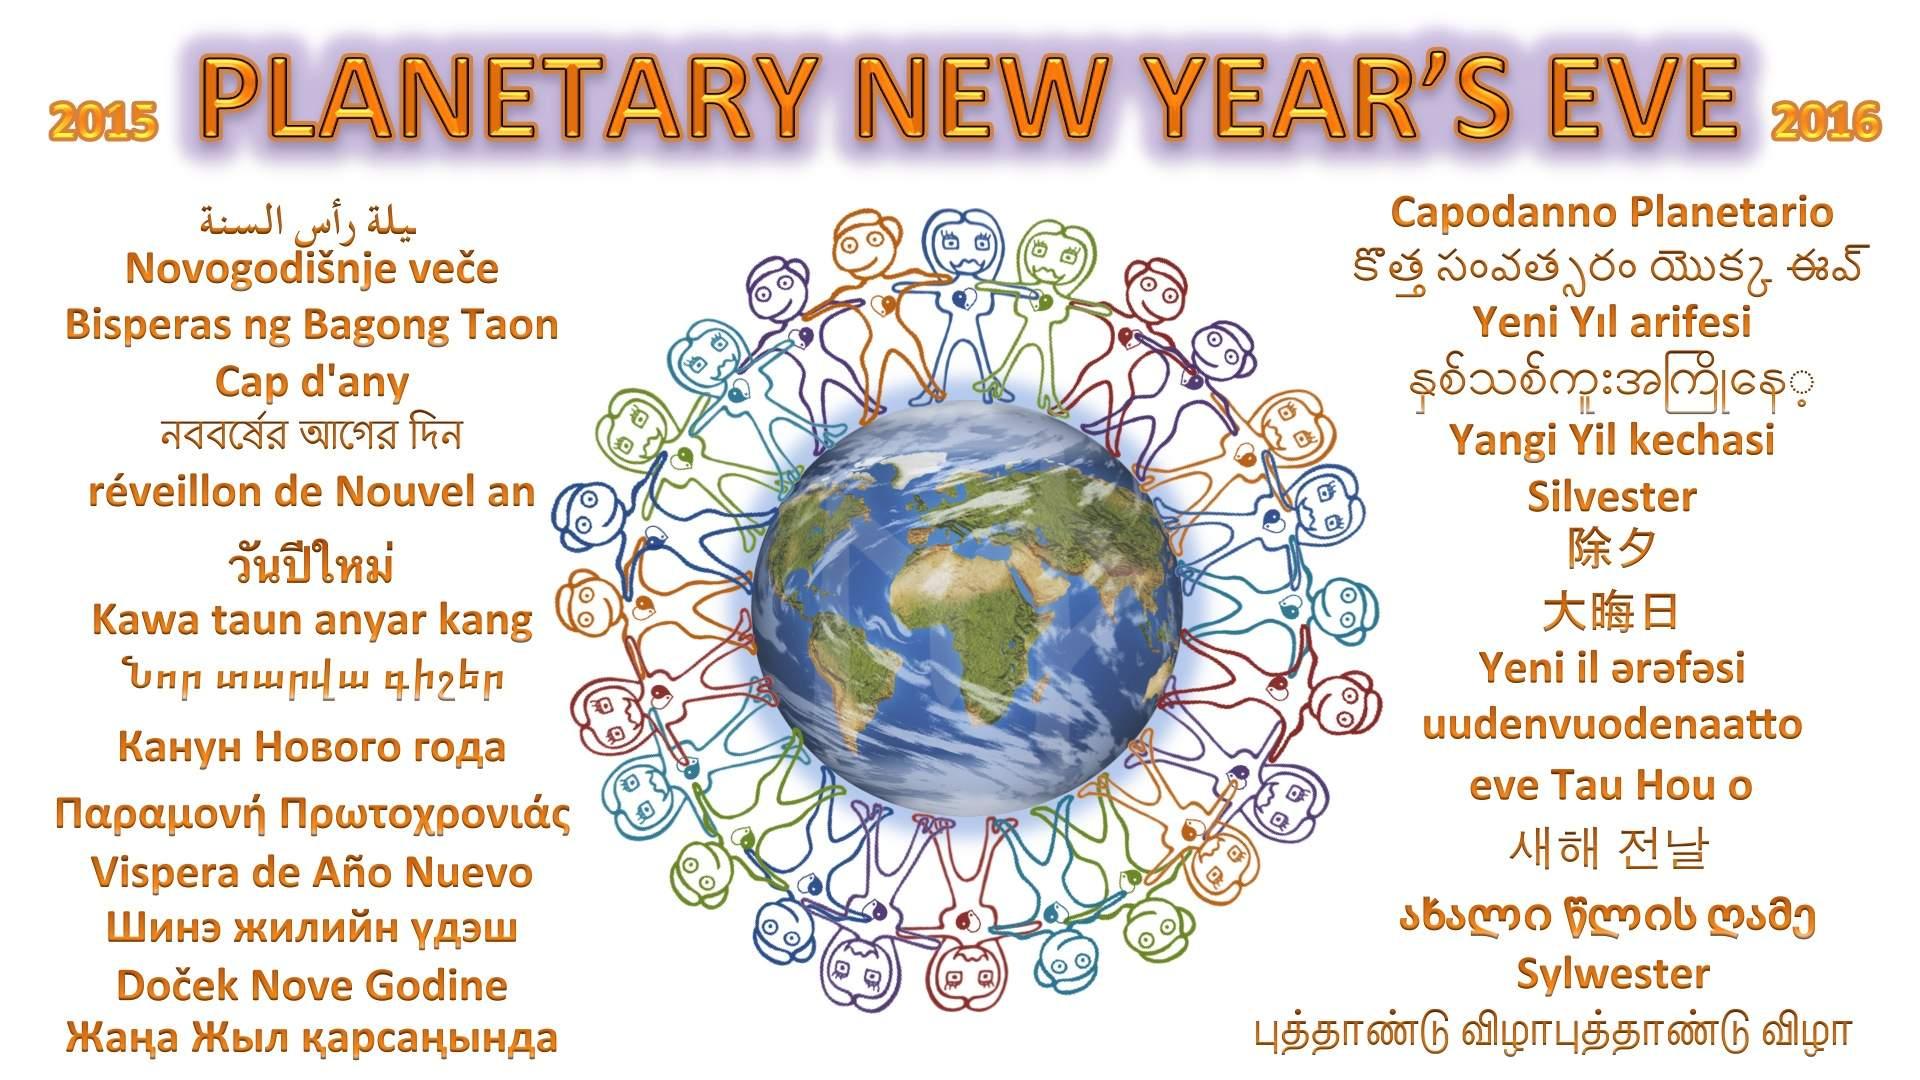 PIC Capodanno planetario 1.1 res